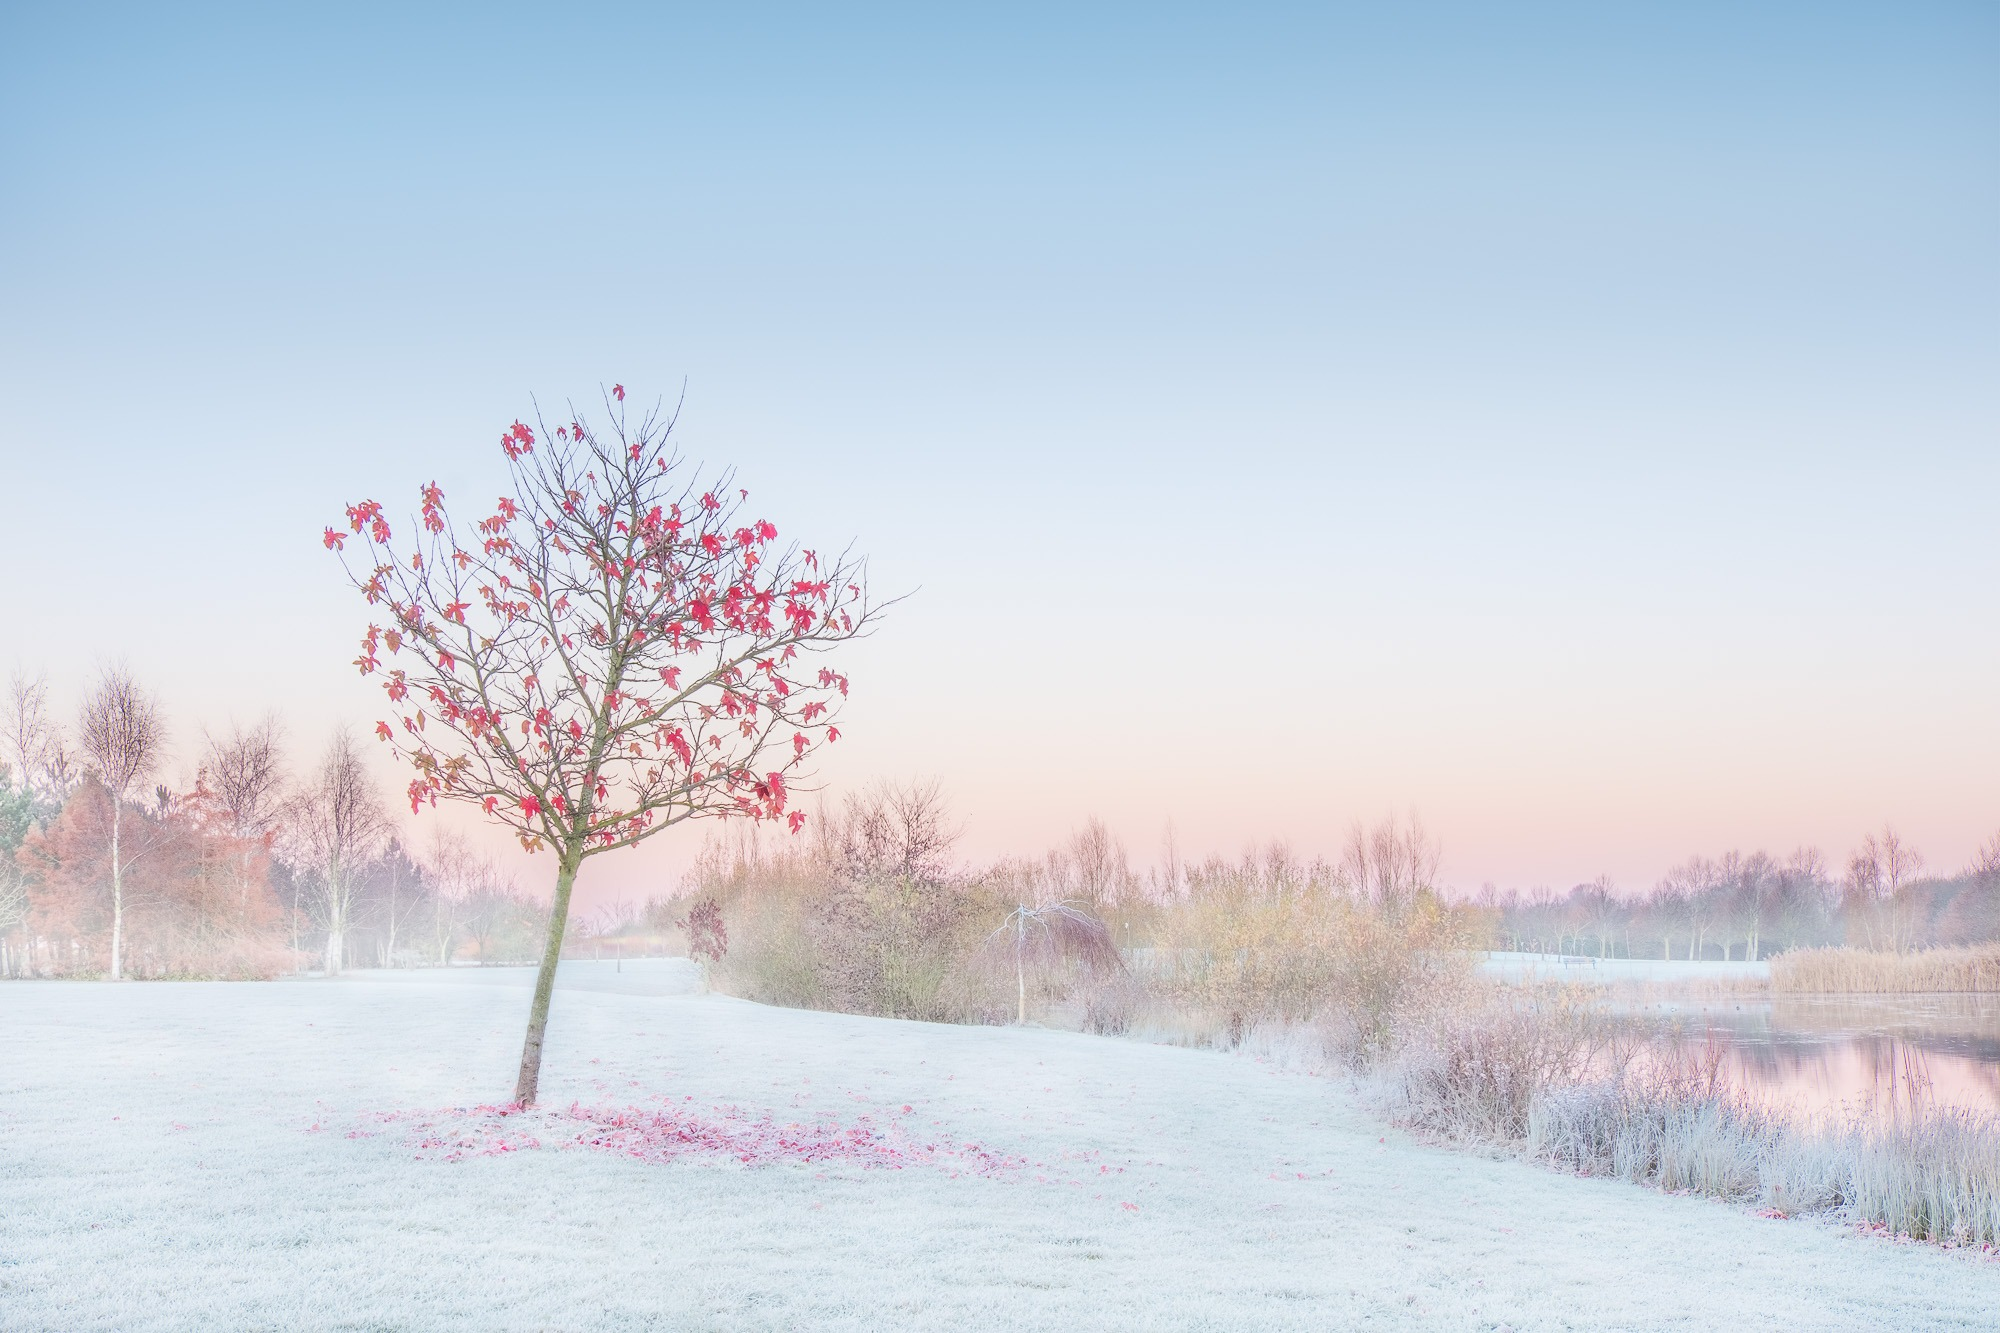 Frosty Wonder